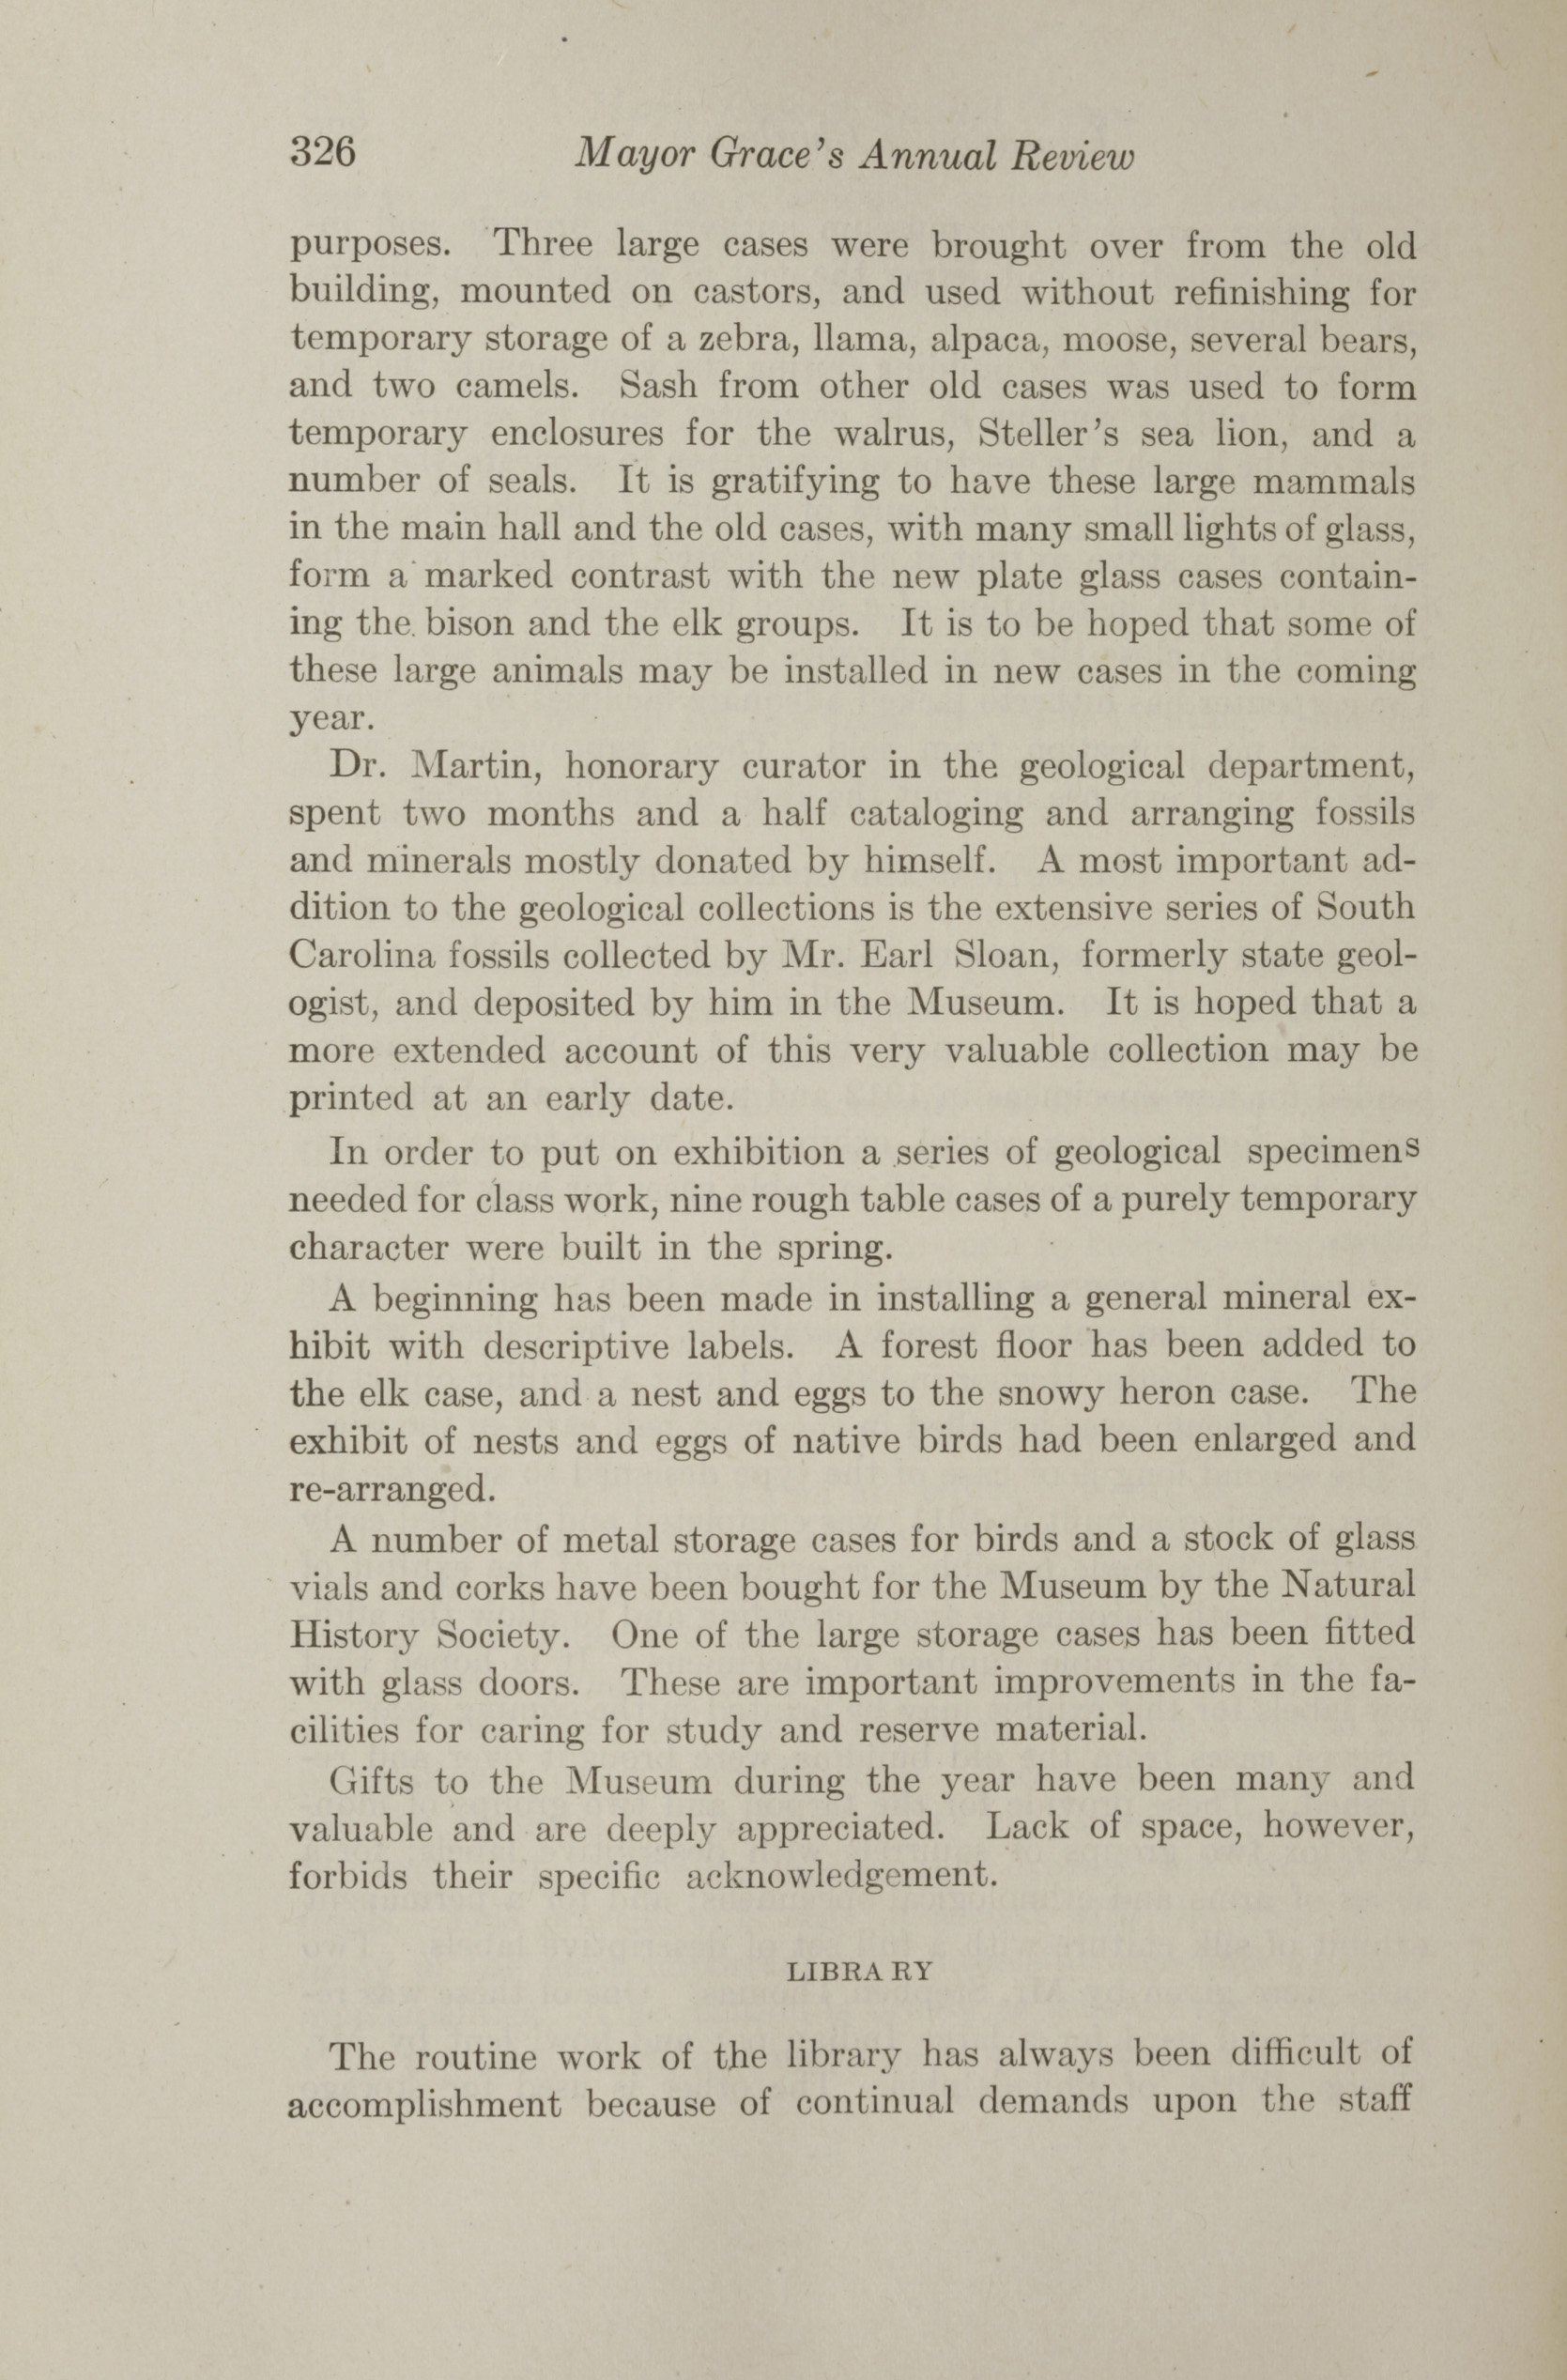 Charleston Yearbook, 1912, page 326